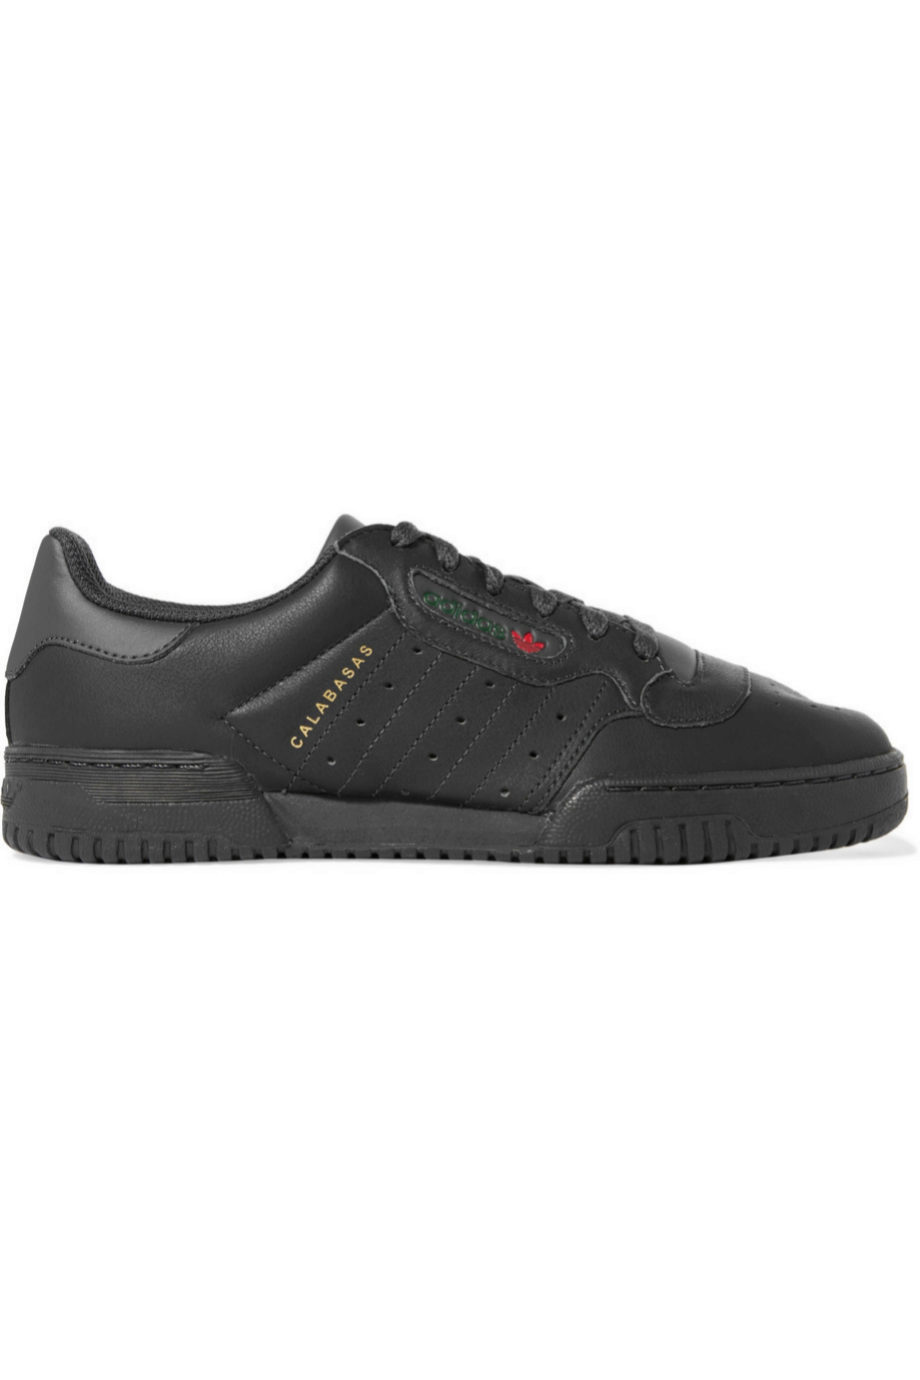 Zapatillas modelo + Yeezy Powerphase Calabasas de Adidas